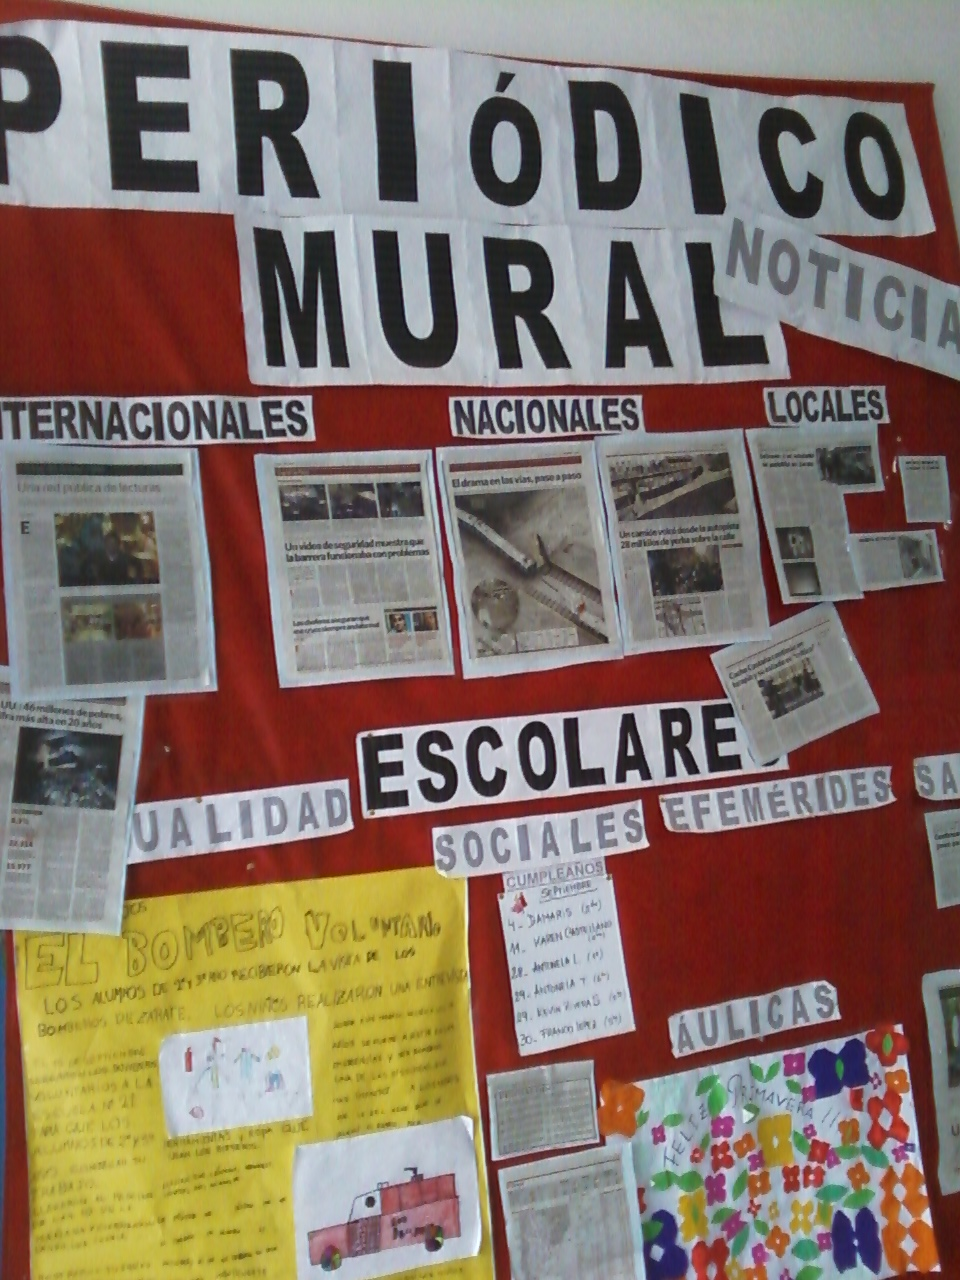 Peri dico virtual 21 periodico mural for El mural periodico jalisco